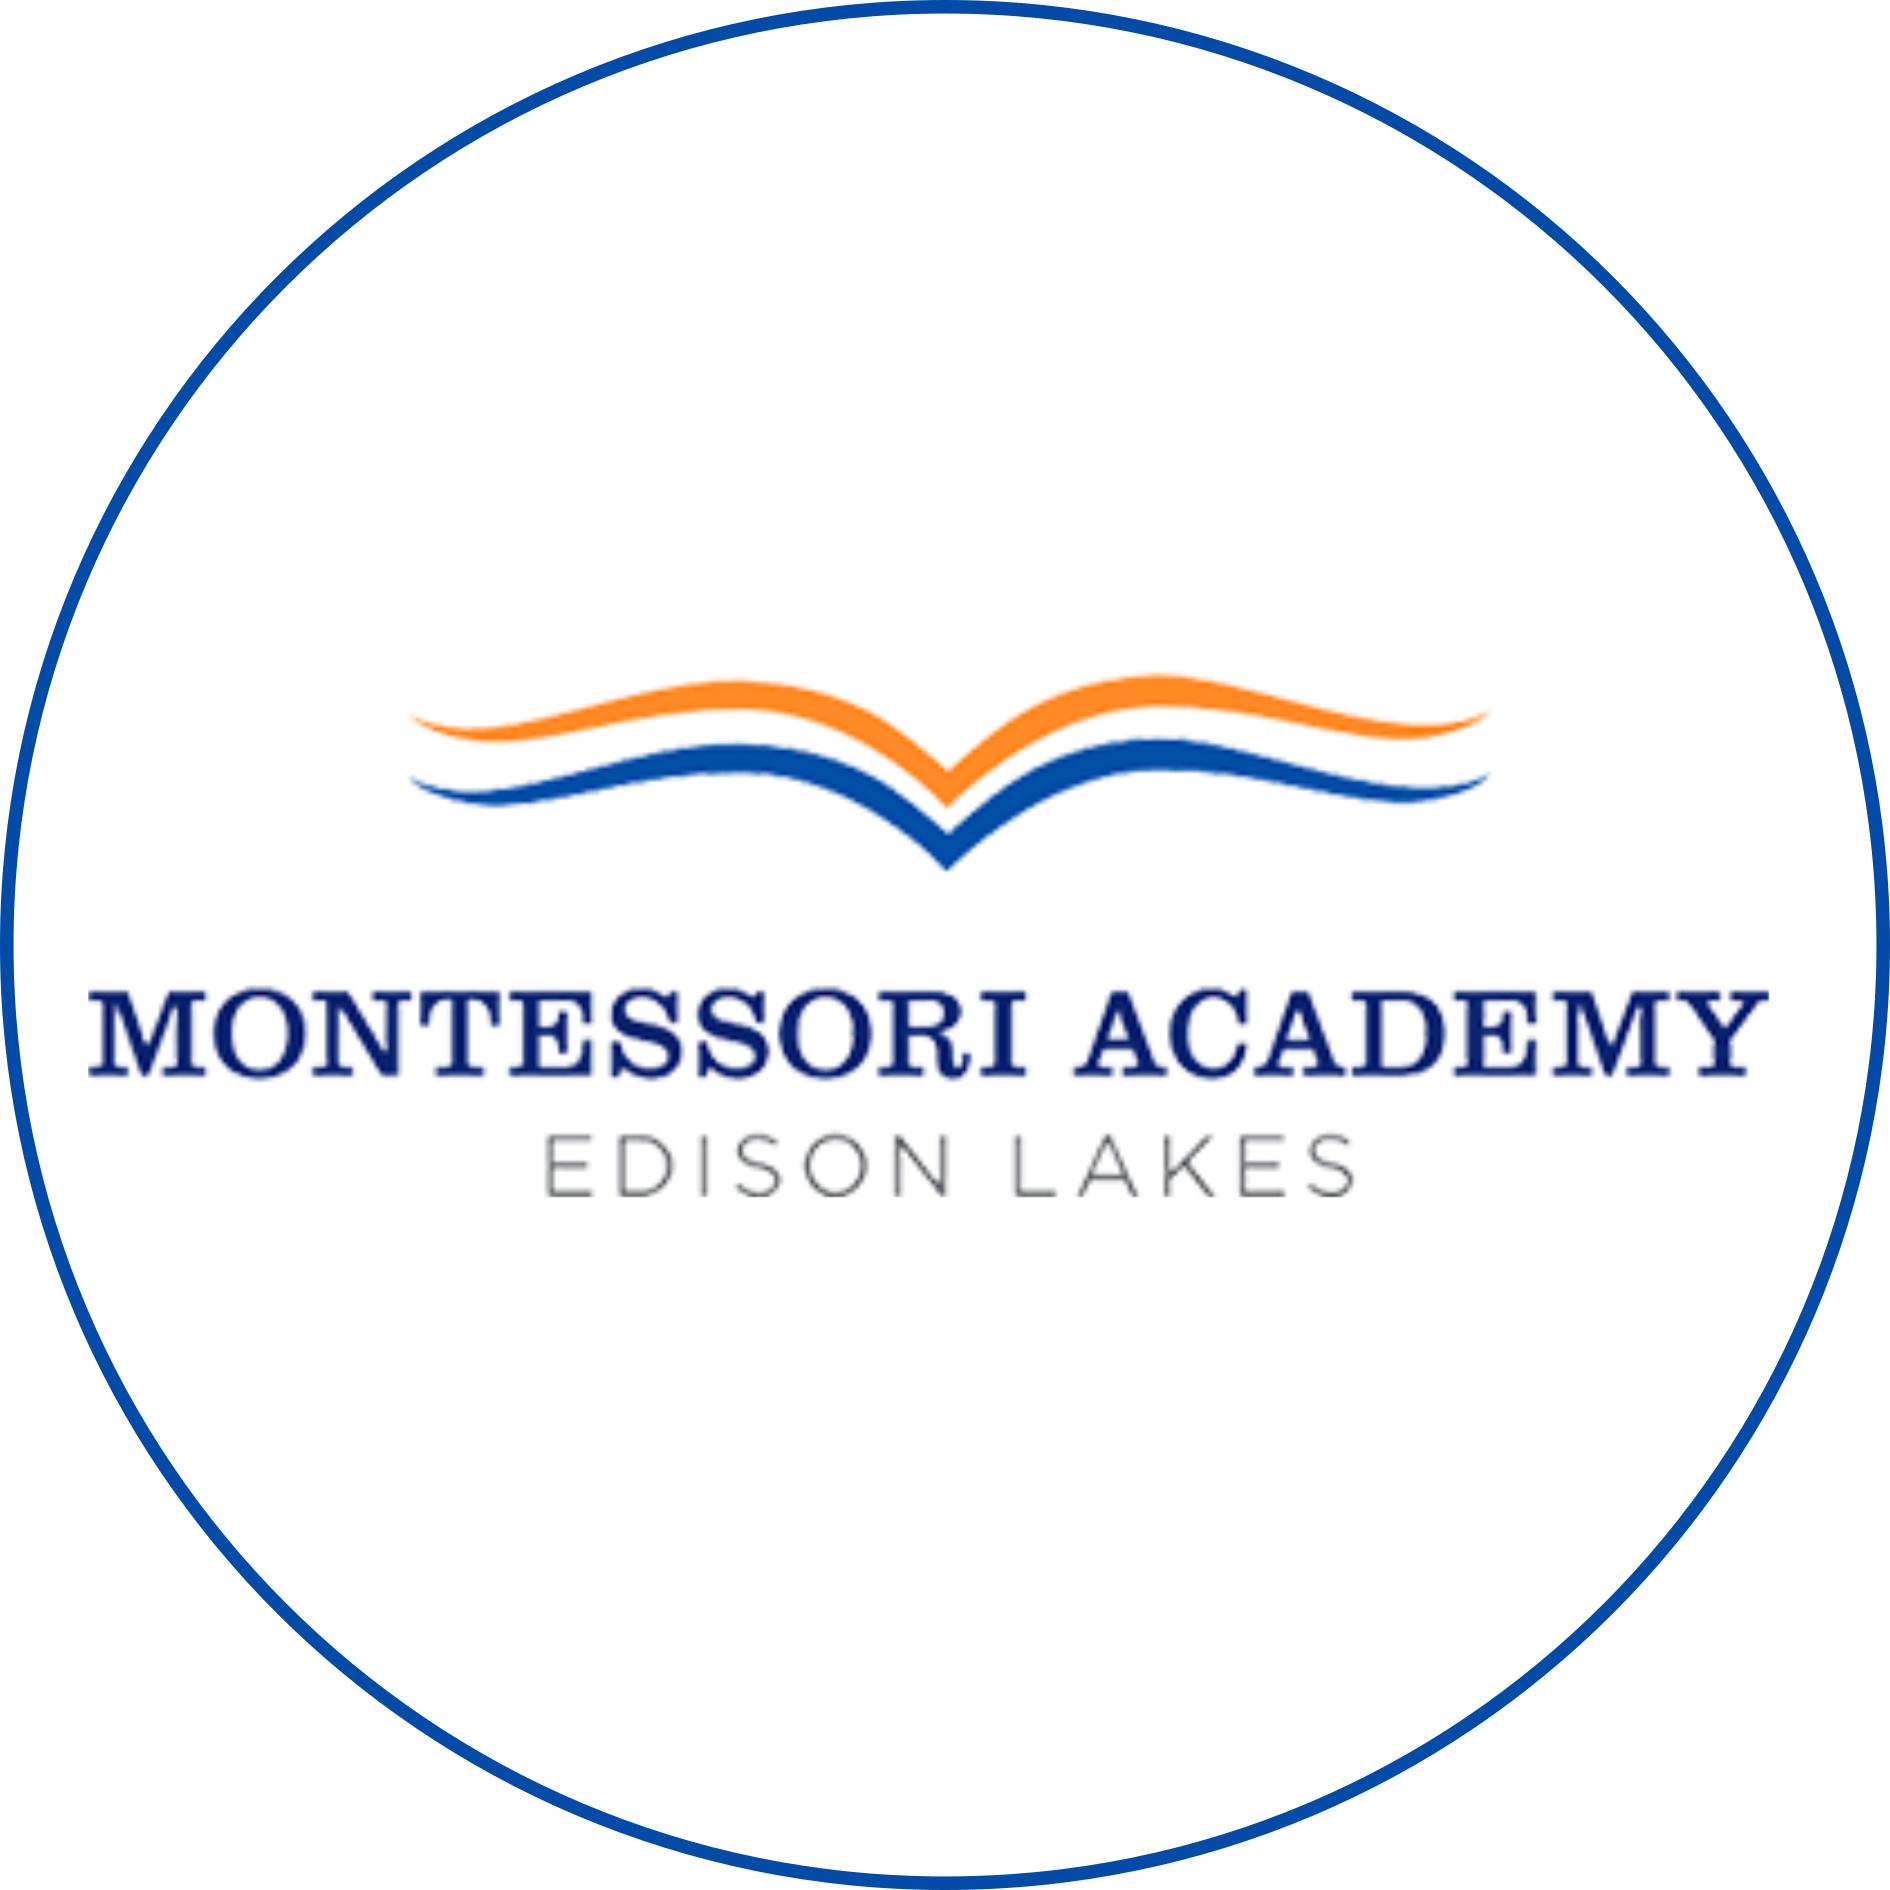 The Montessori Academy at Edison Lakes - Mishawaka, IndianaFull Member